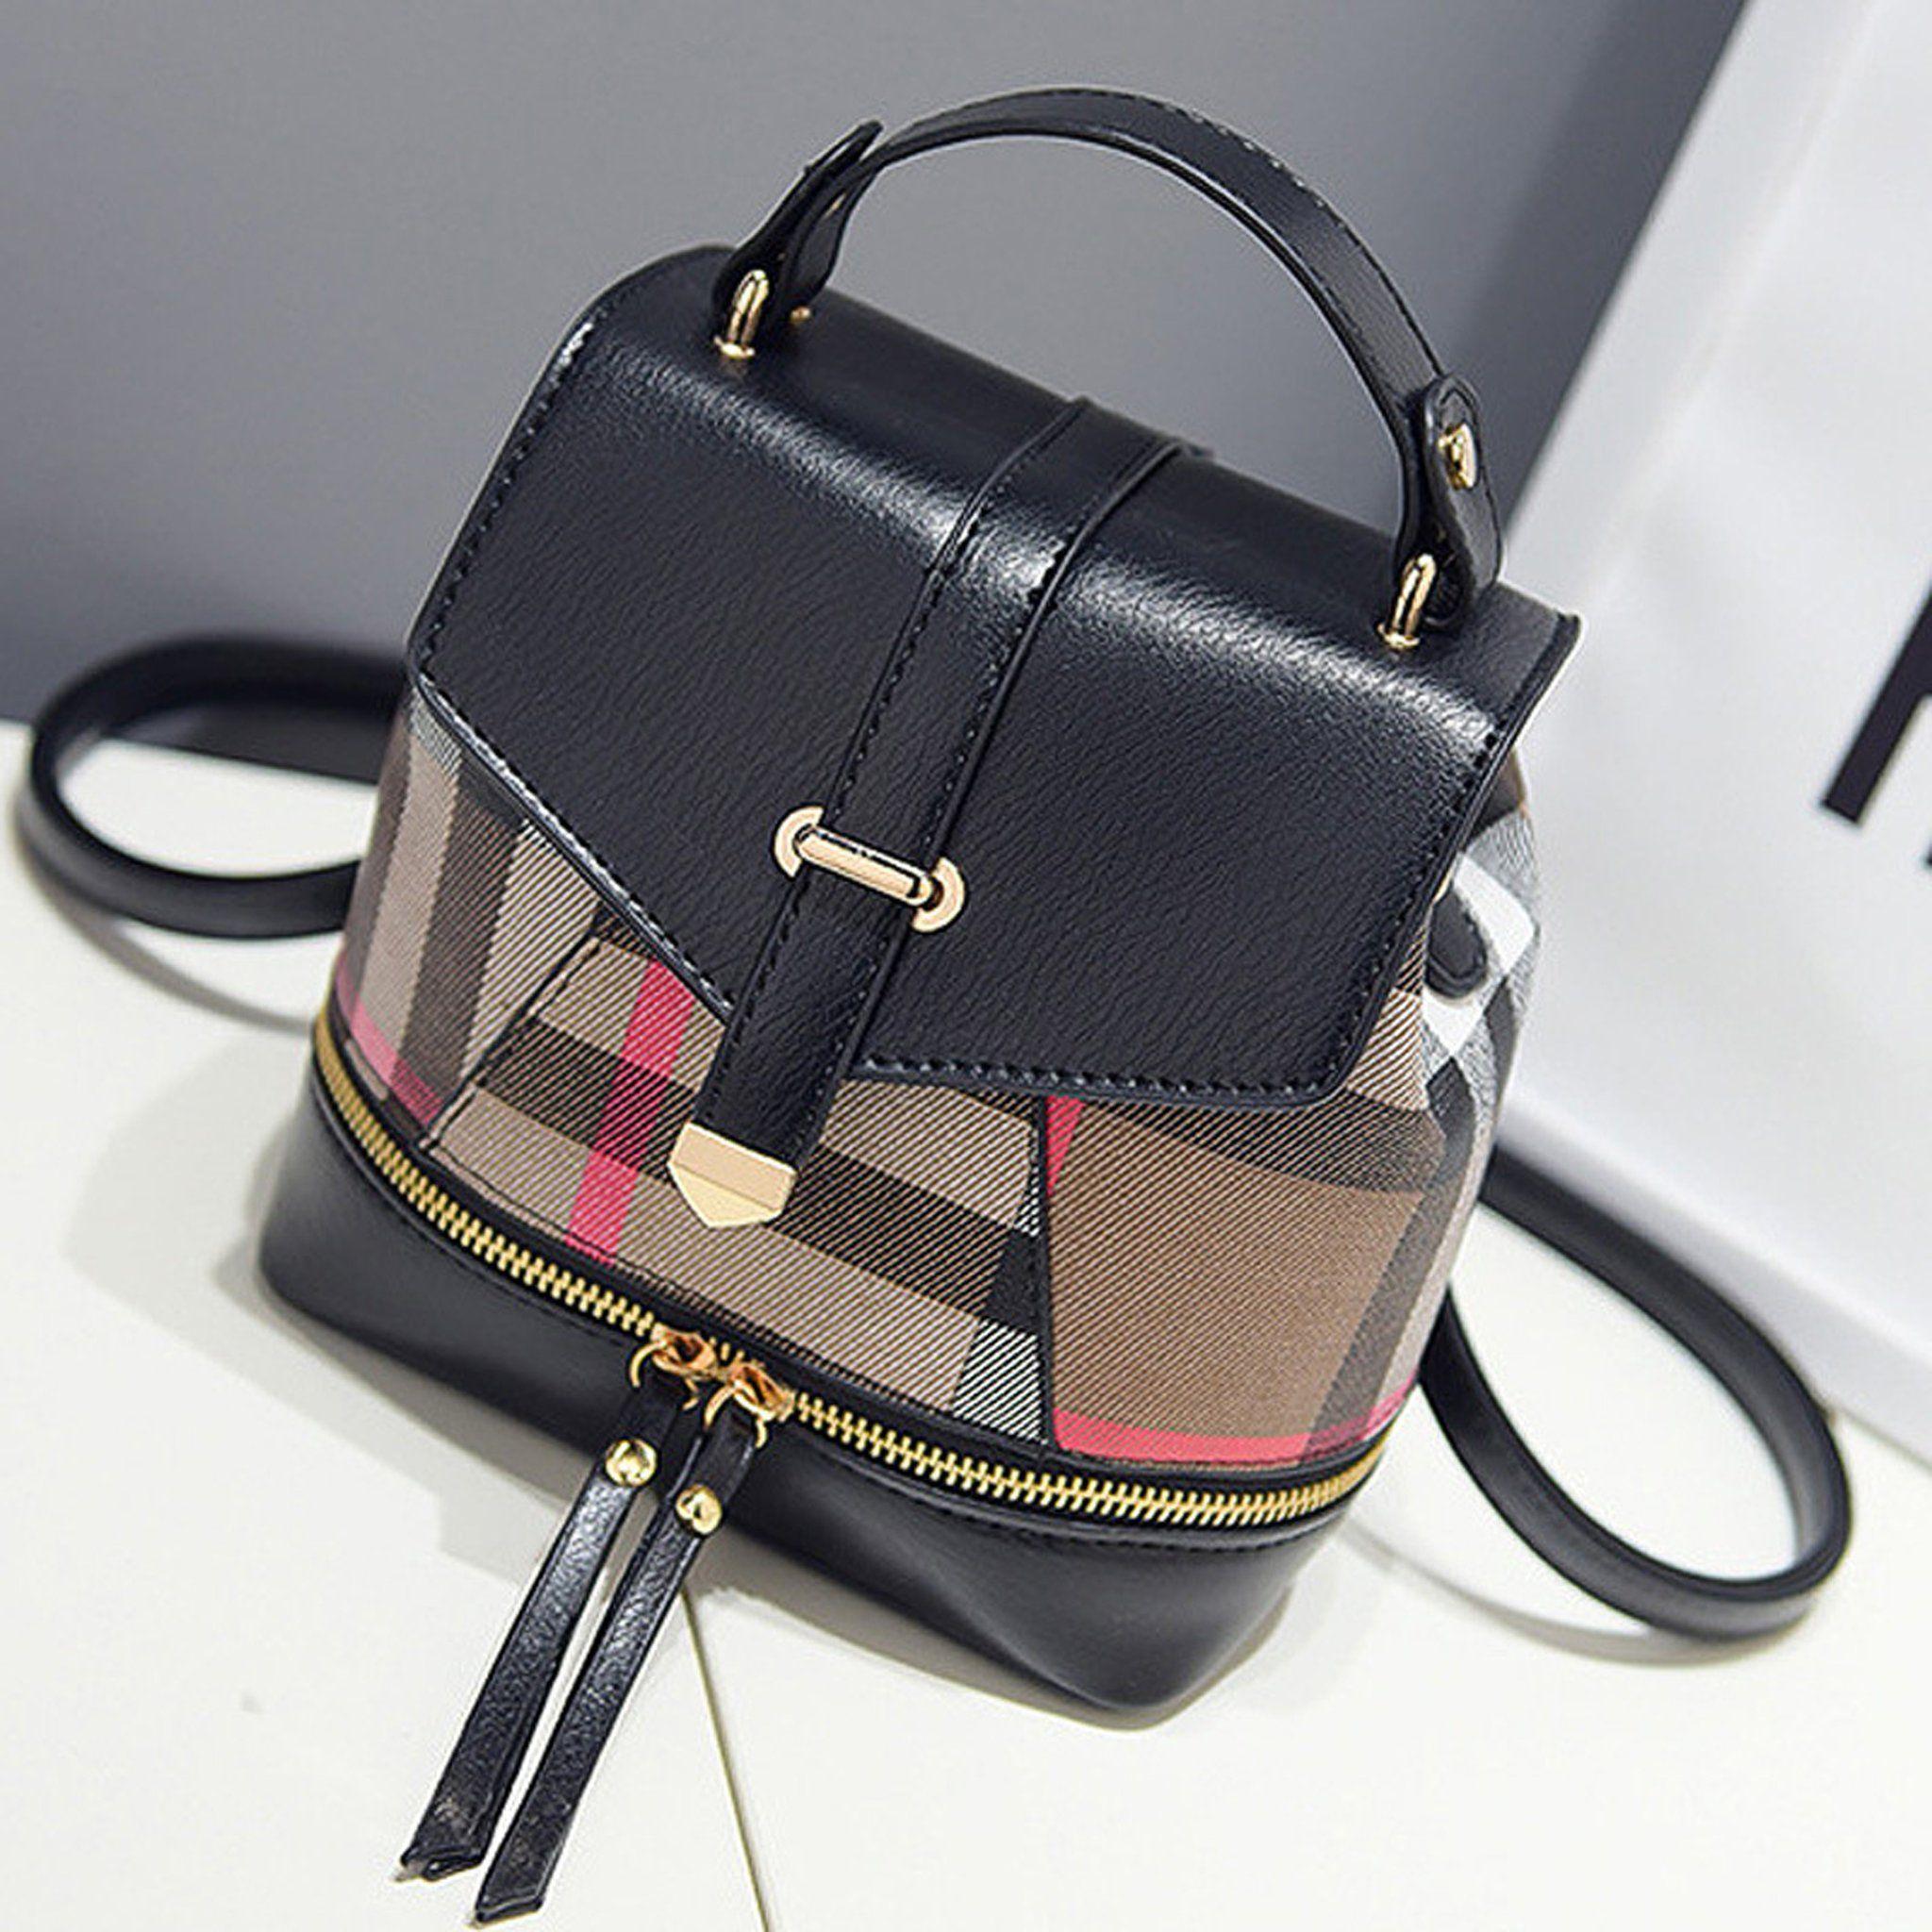 Dolca Cute Designer Pleather Mini Plaid Backpack Knapsack Purse Bag with  Gold Hardware - www.GlamantiBeauty.com 1e946673e1d19